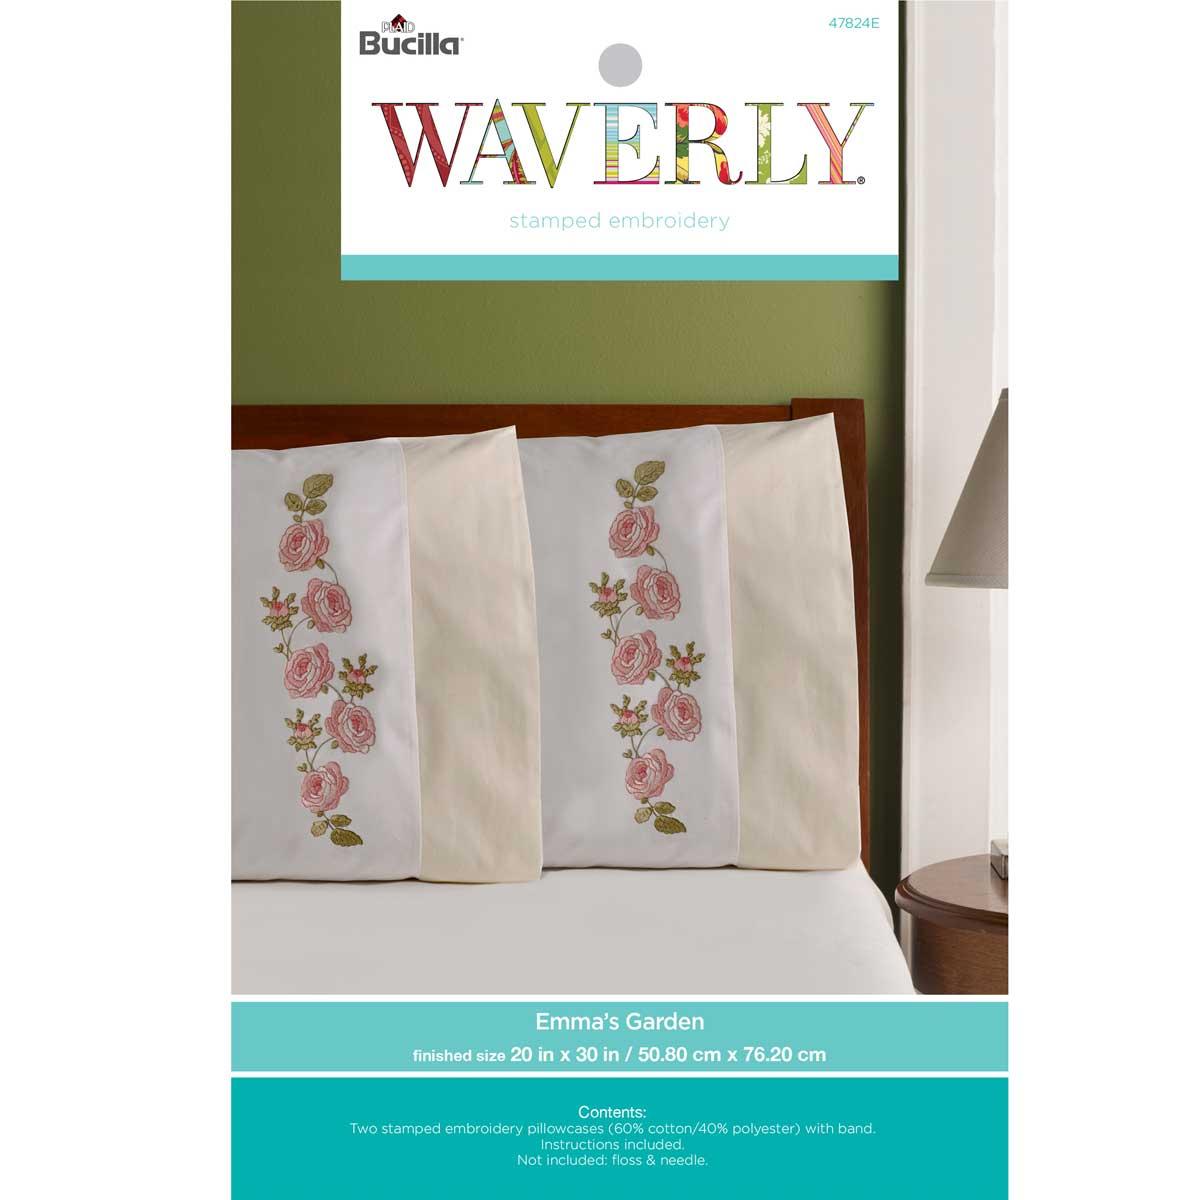 Bucilla ® Waverly ® Emma's Garden Collection Stamped Pillowcase Pair